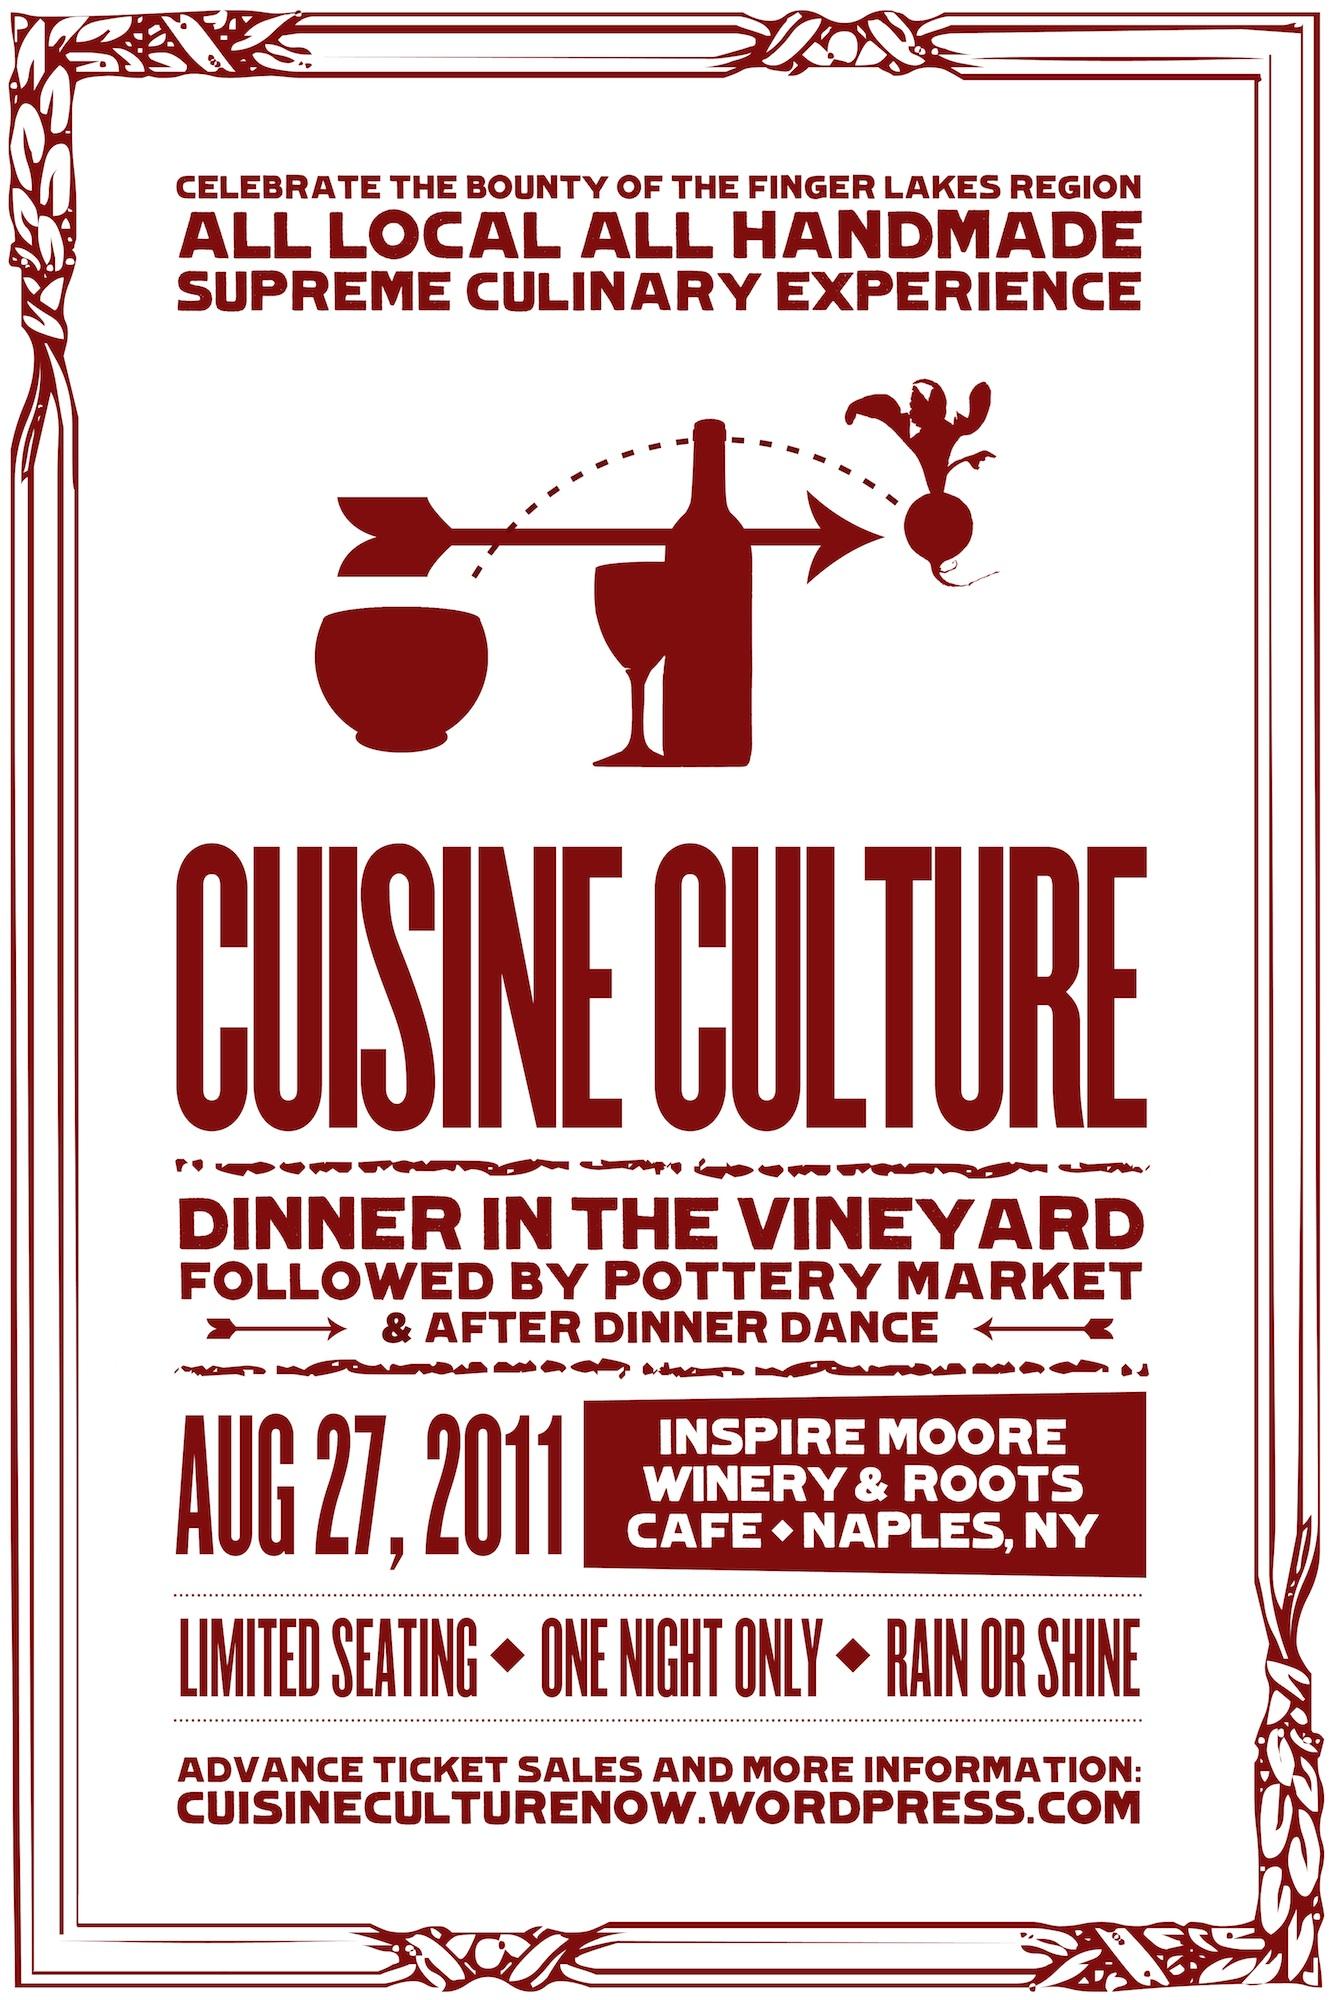 presenting the cuisine culture poster! | cuisine culture now